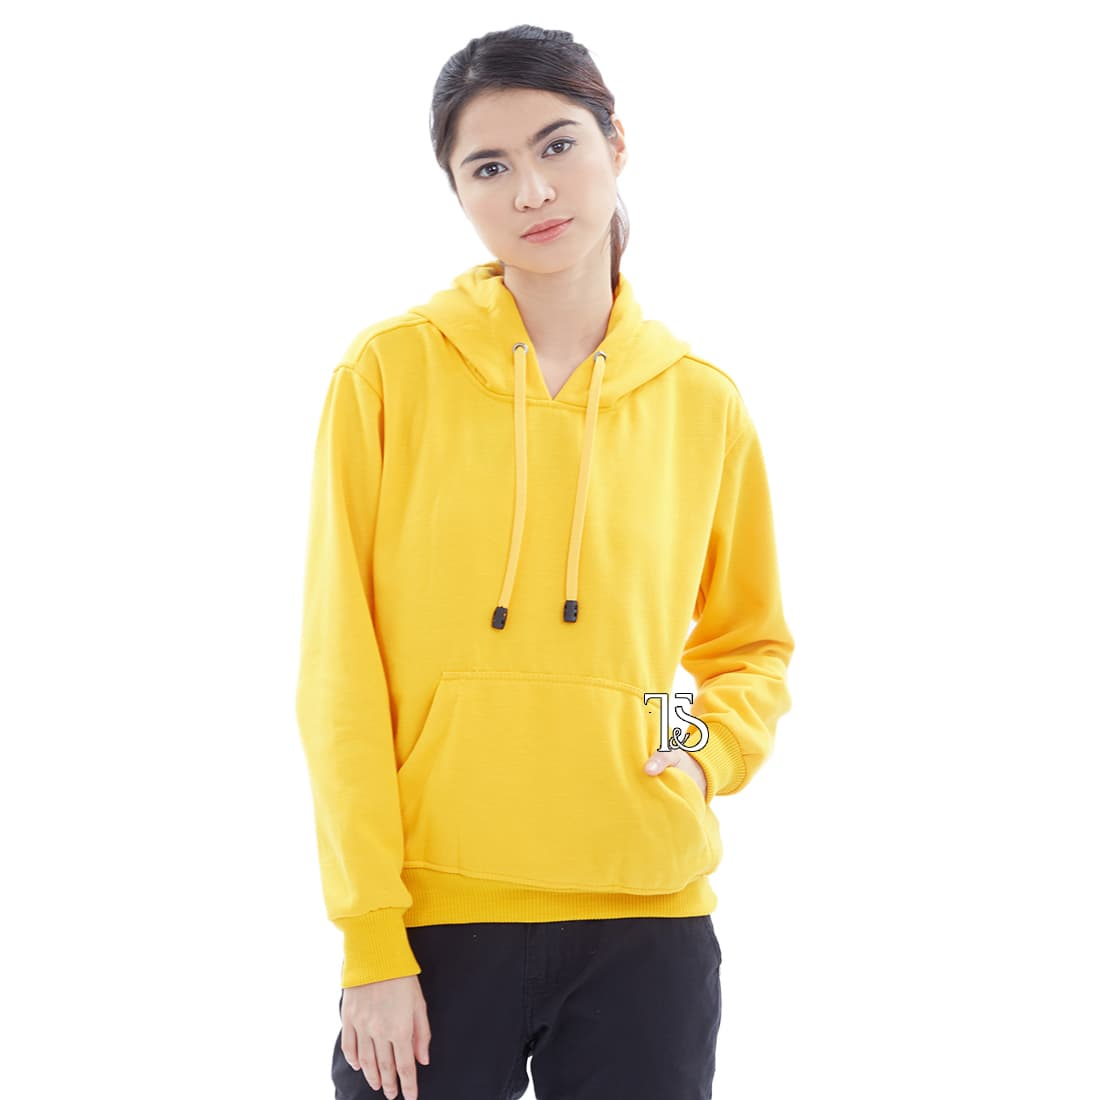 Jual Jaket Hoodie Jumper Kuning Polos Wanita M Xl Bajukitaindo Sweater Biru Turkis Tokopedia